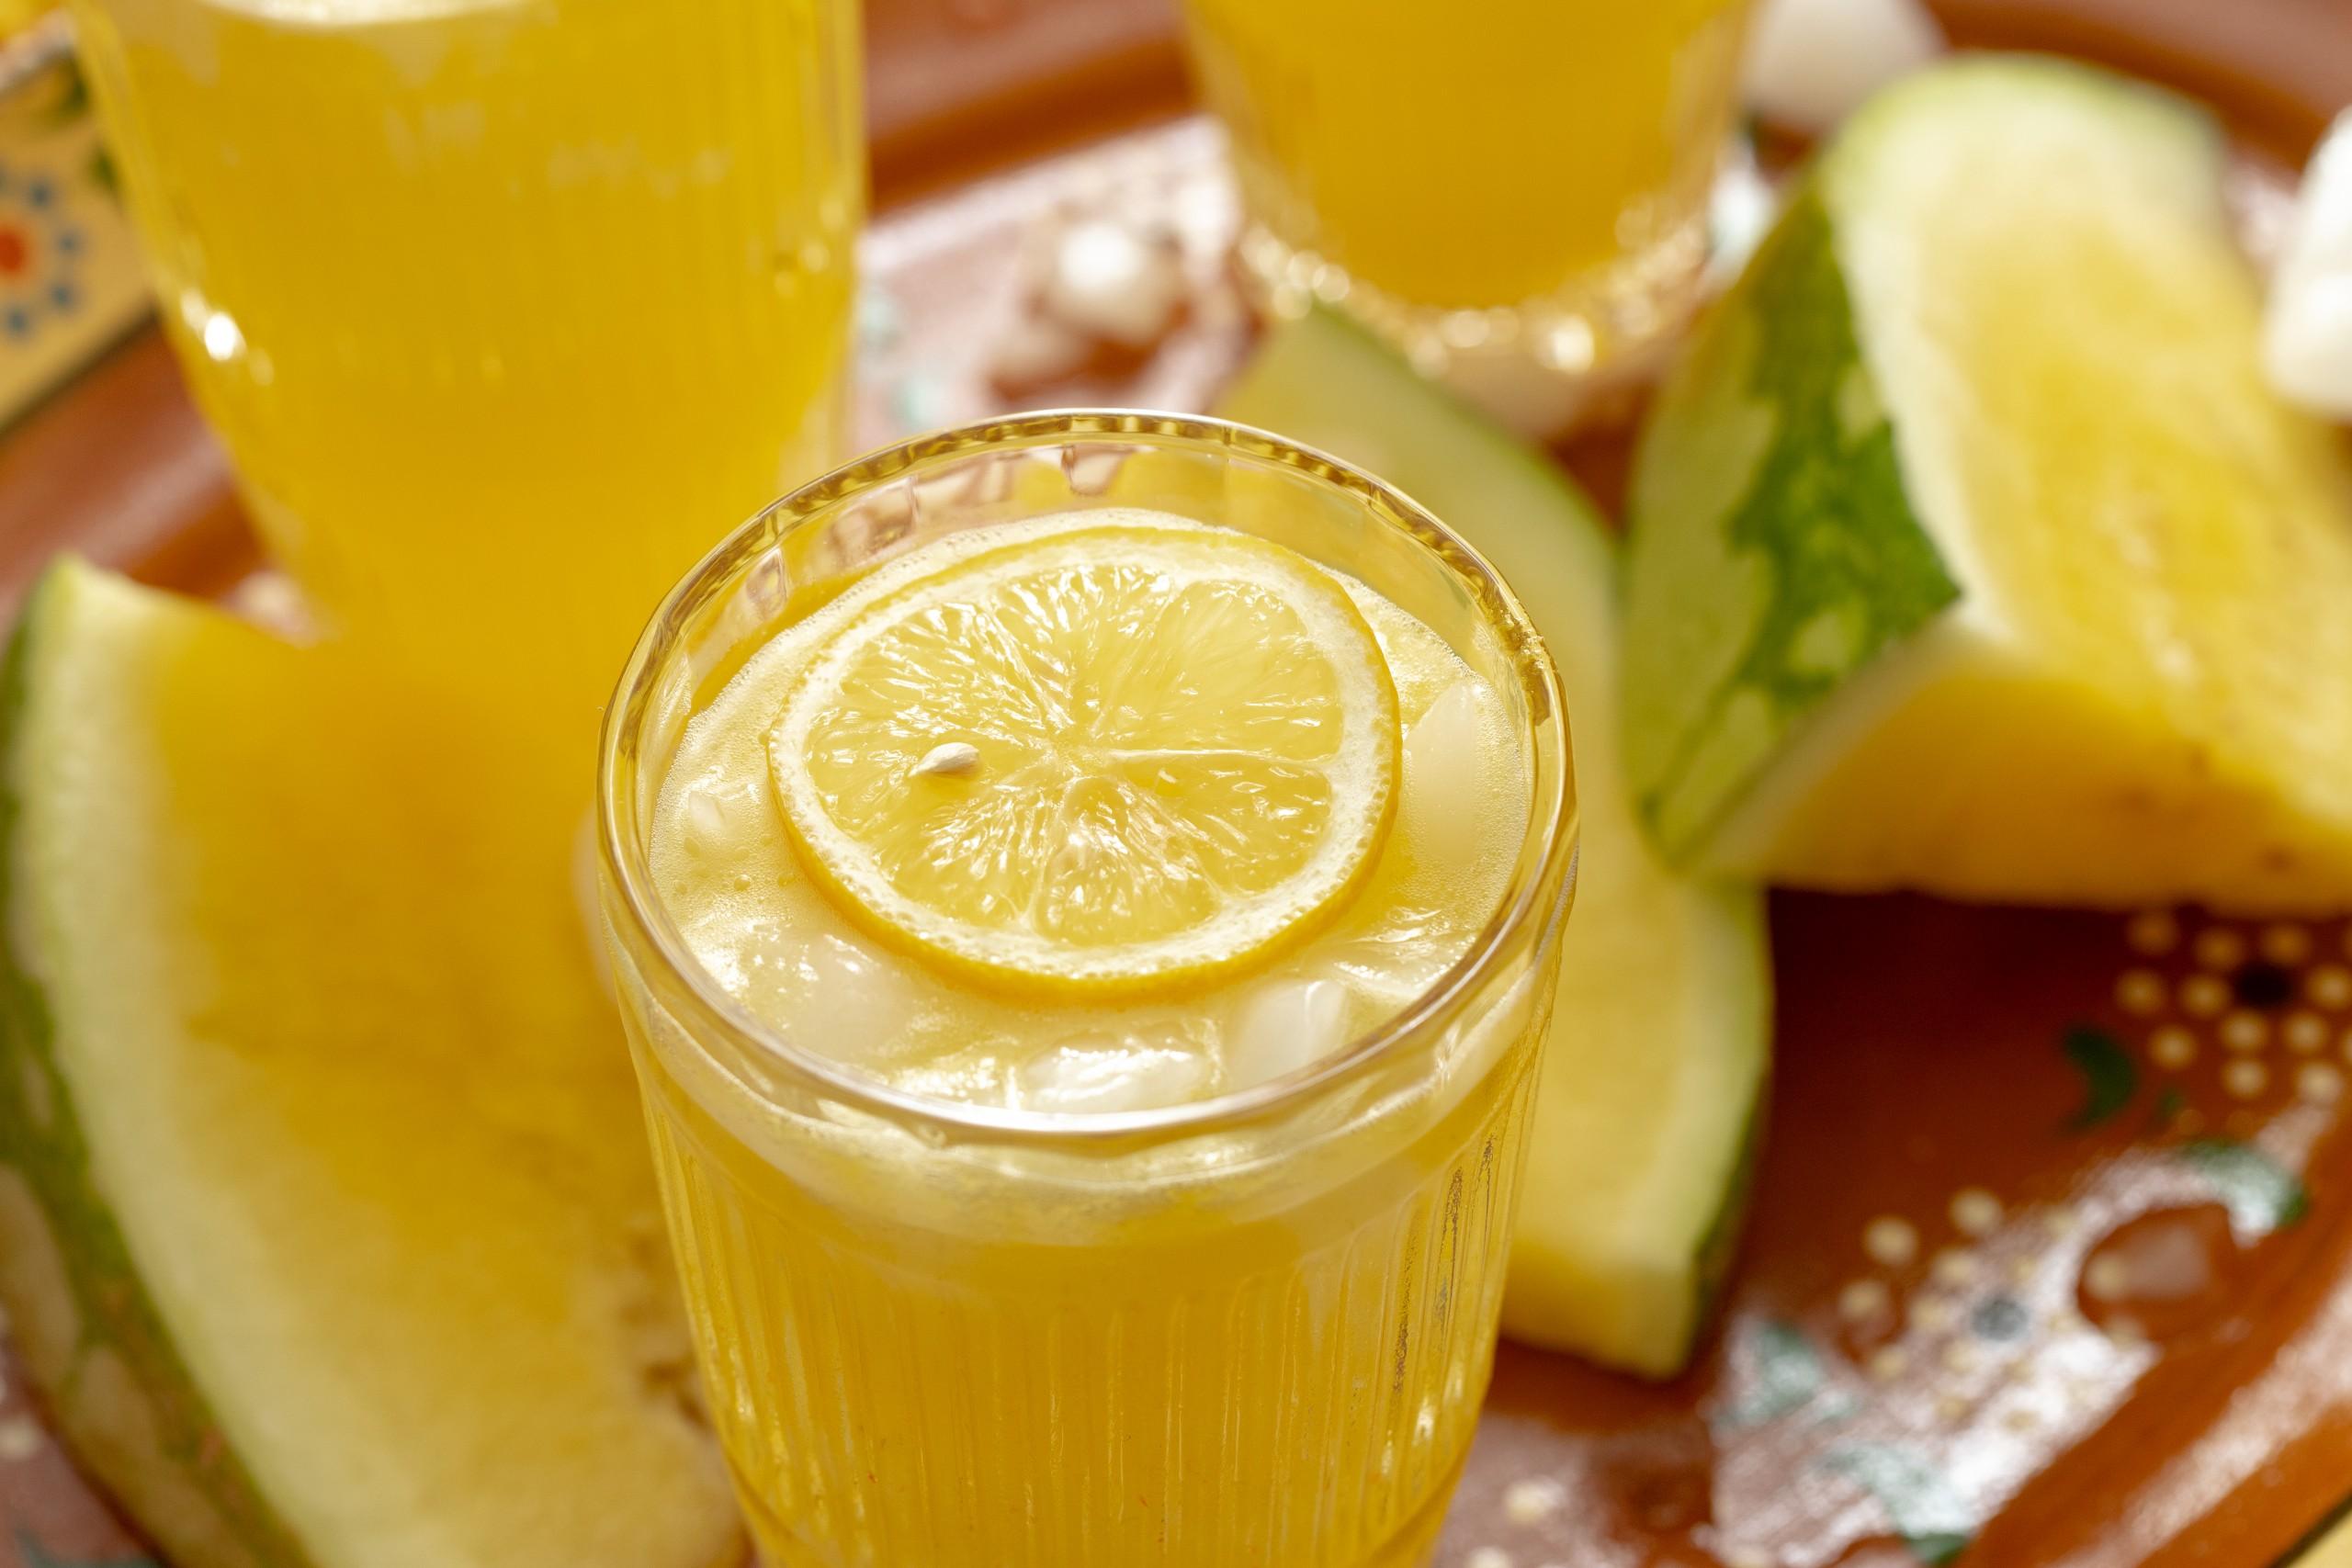 yellow watermelon lemonade made in the blender